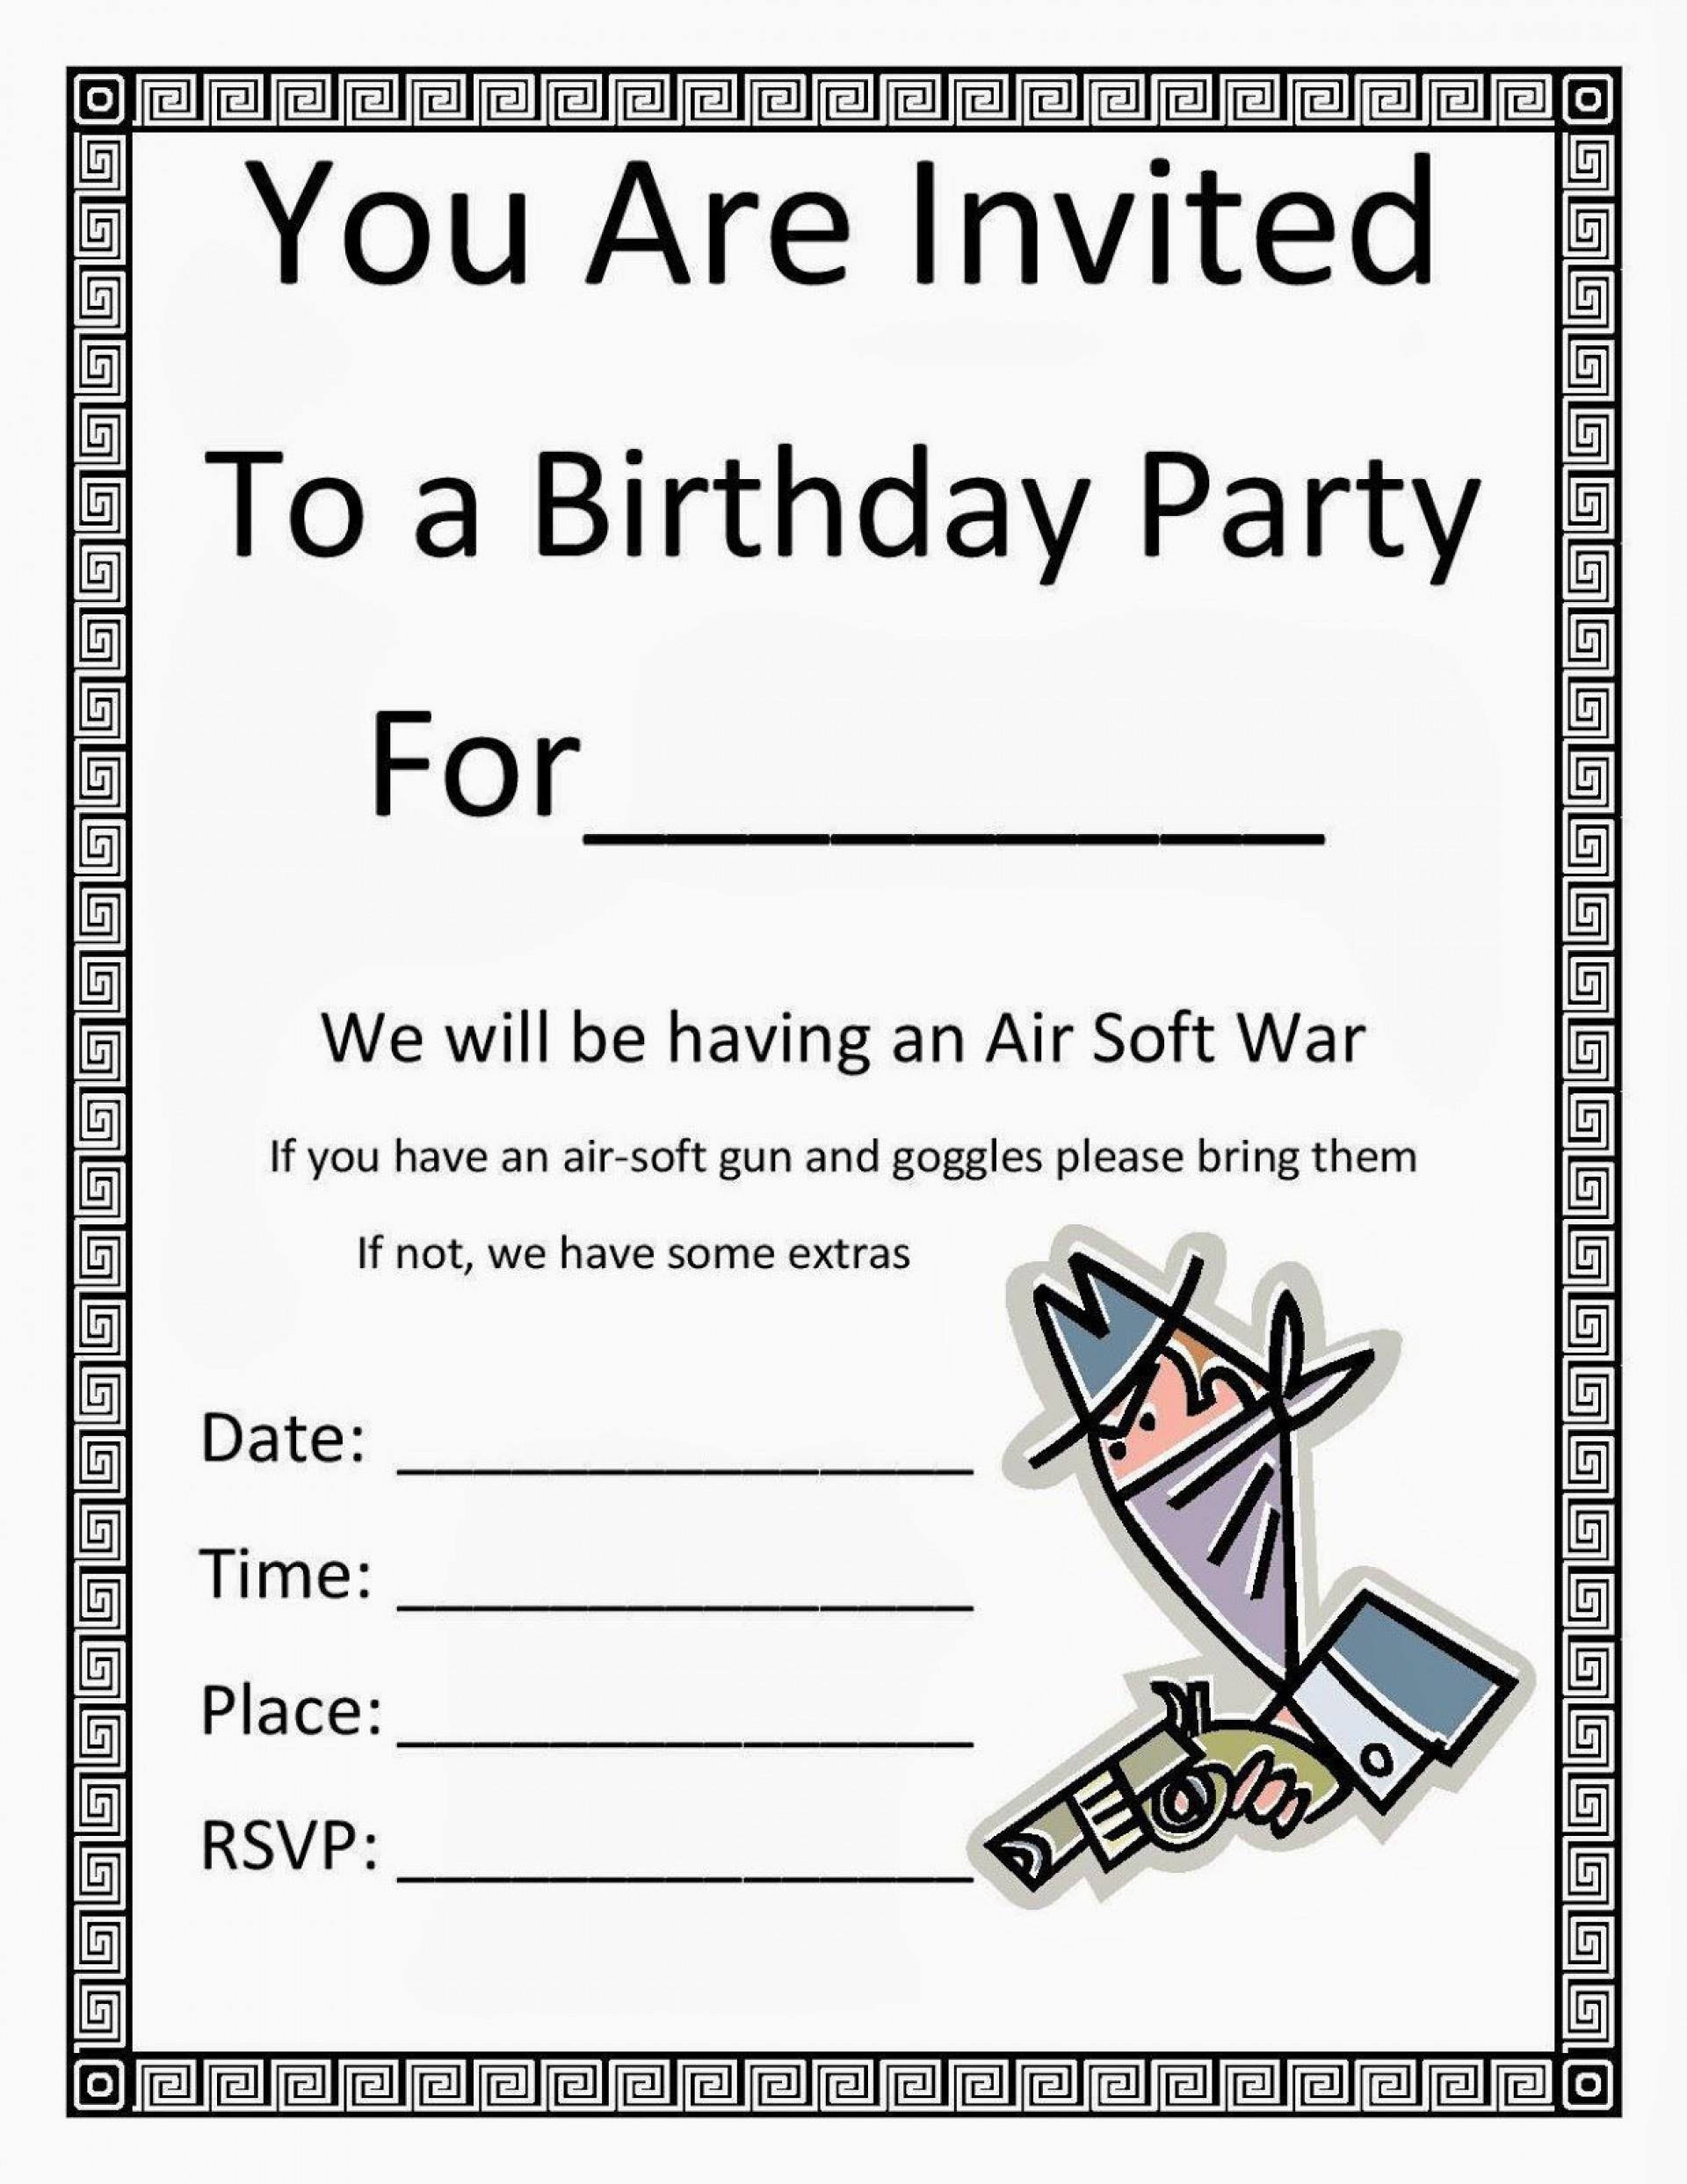 000 Imposing Party Invitation Template Word Idea  Dinner Summer Wording Sample Unicorn Birthday1920